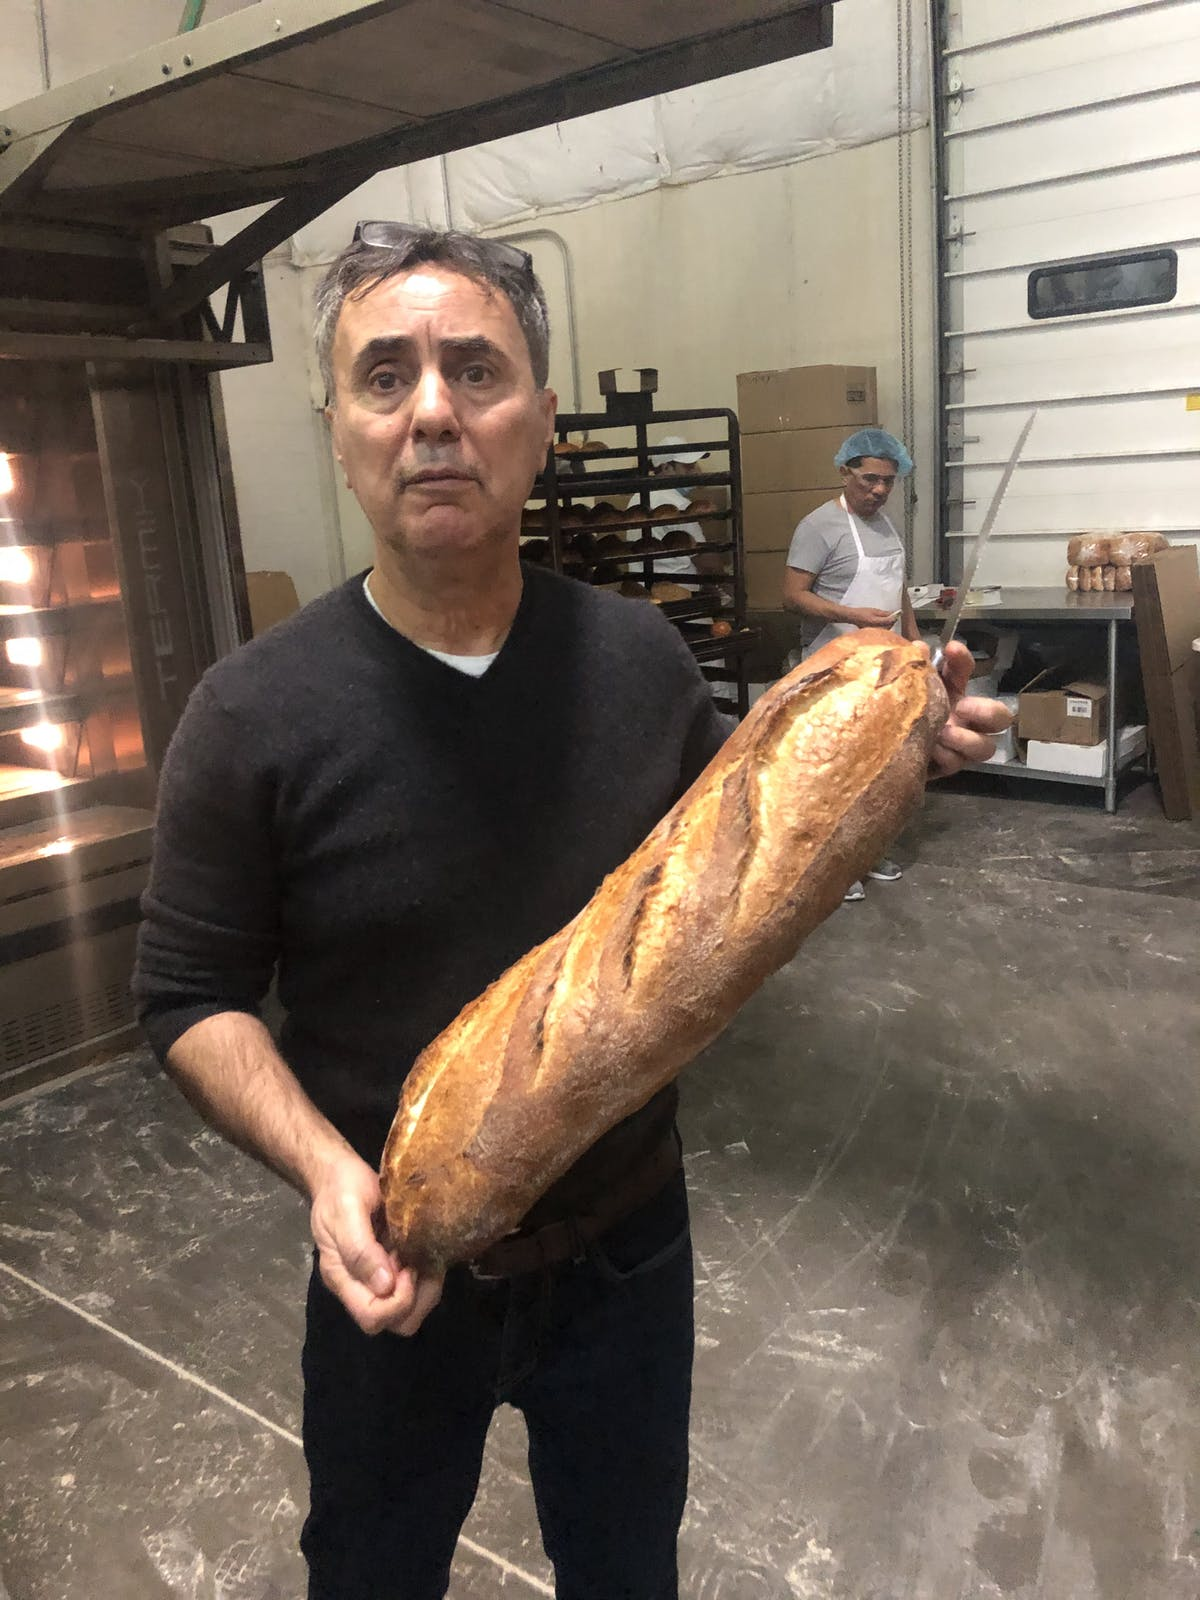 a man holding a baguette